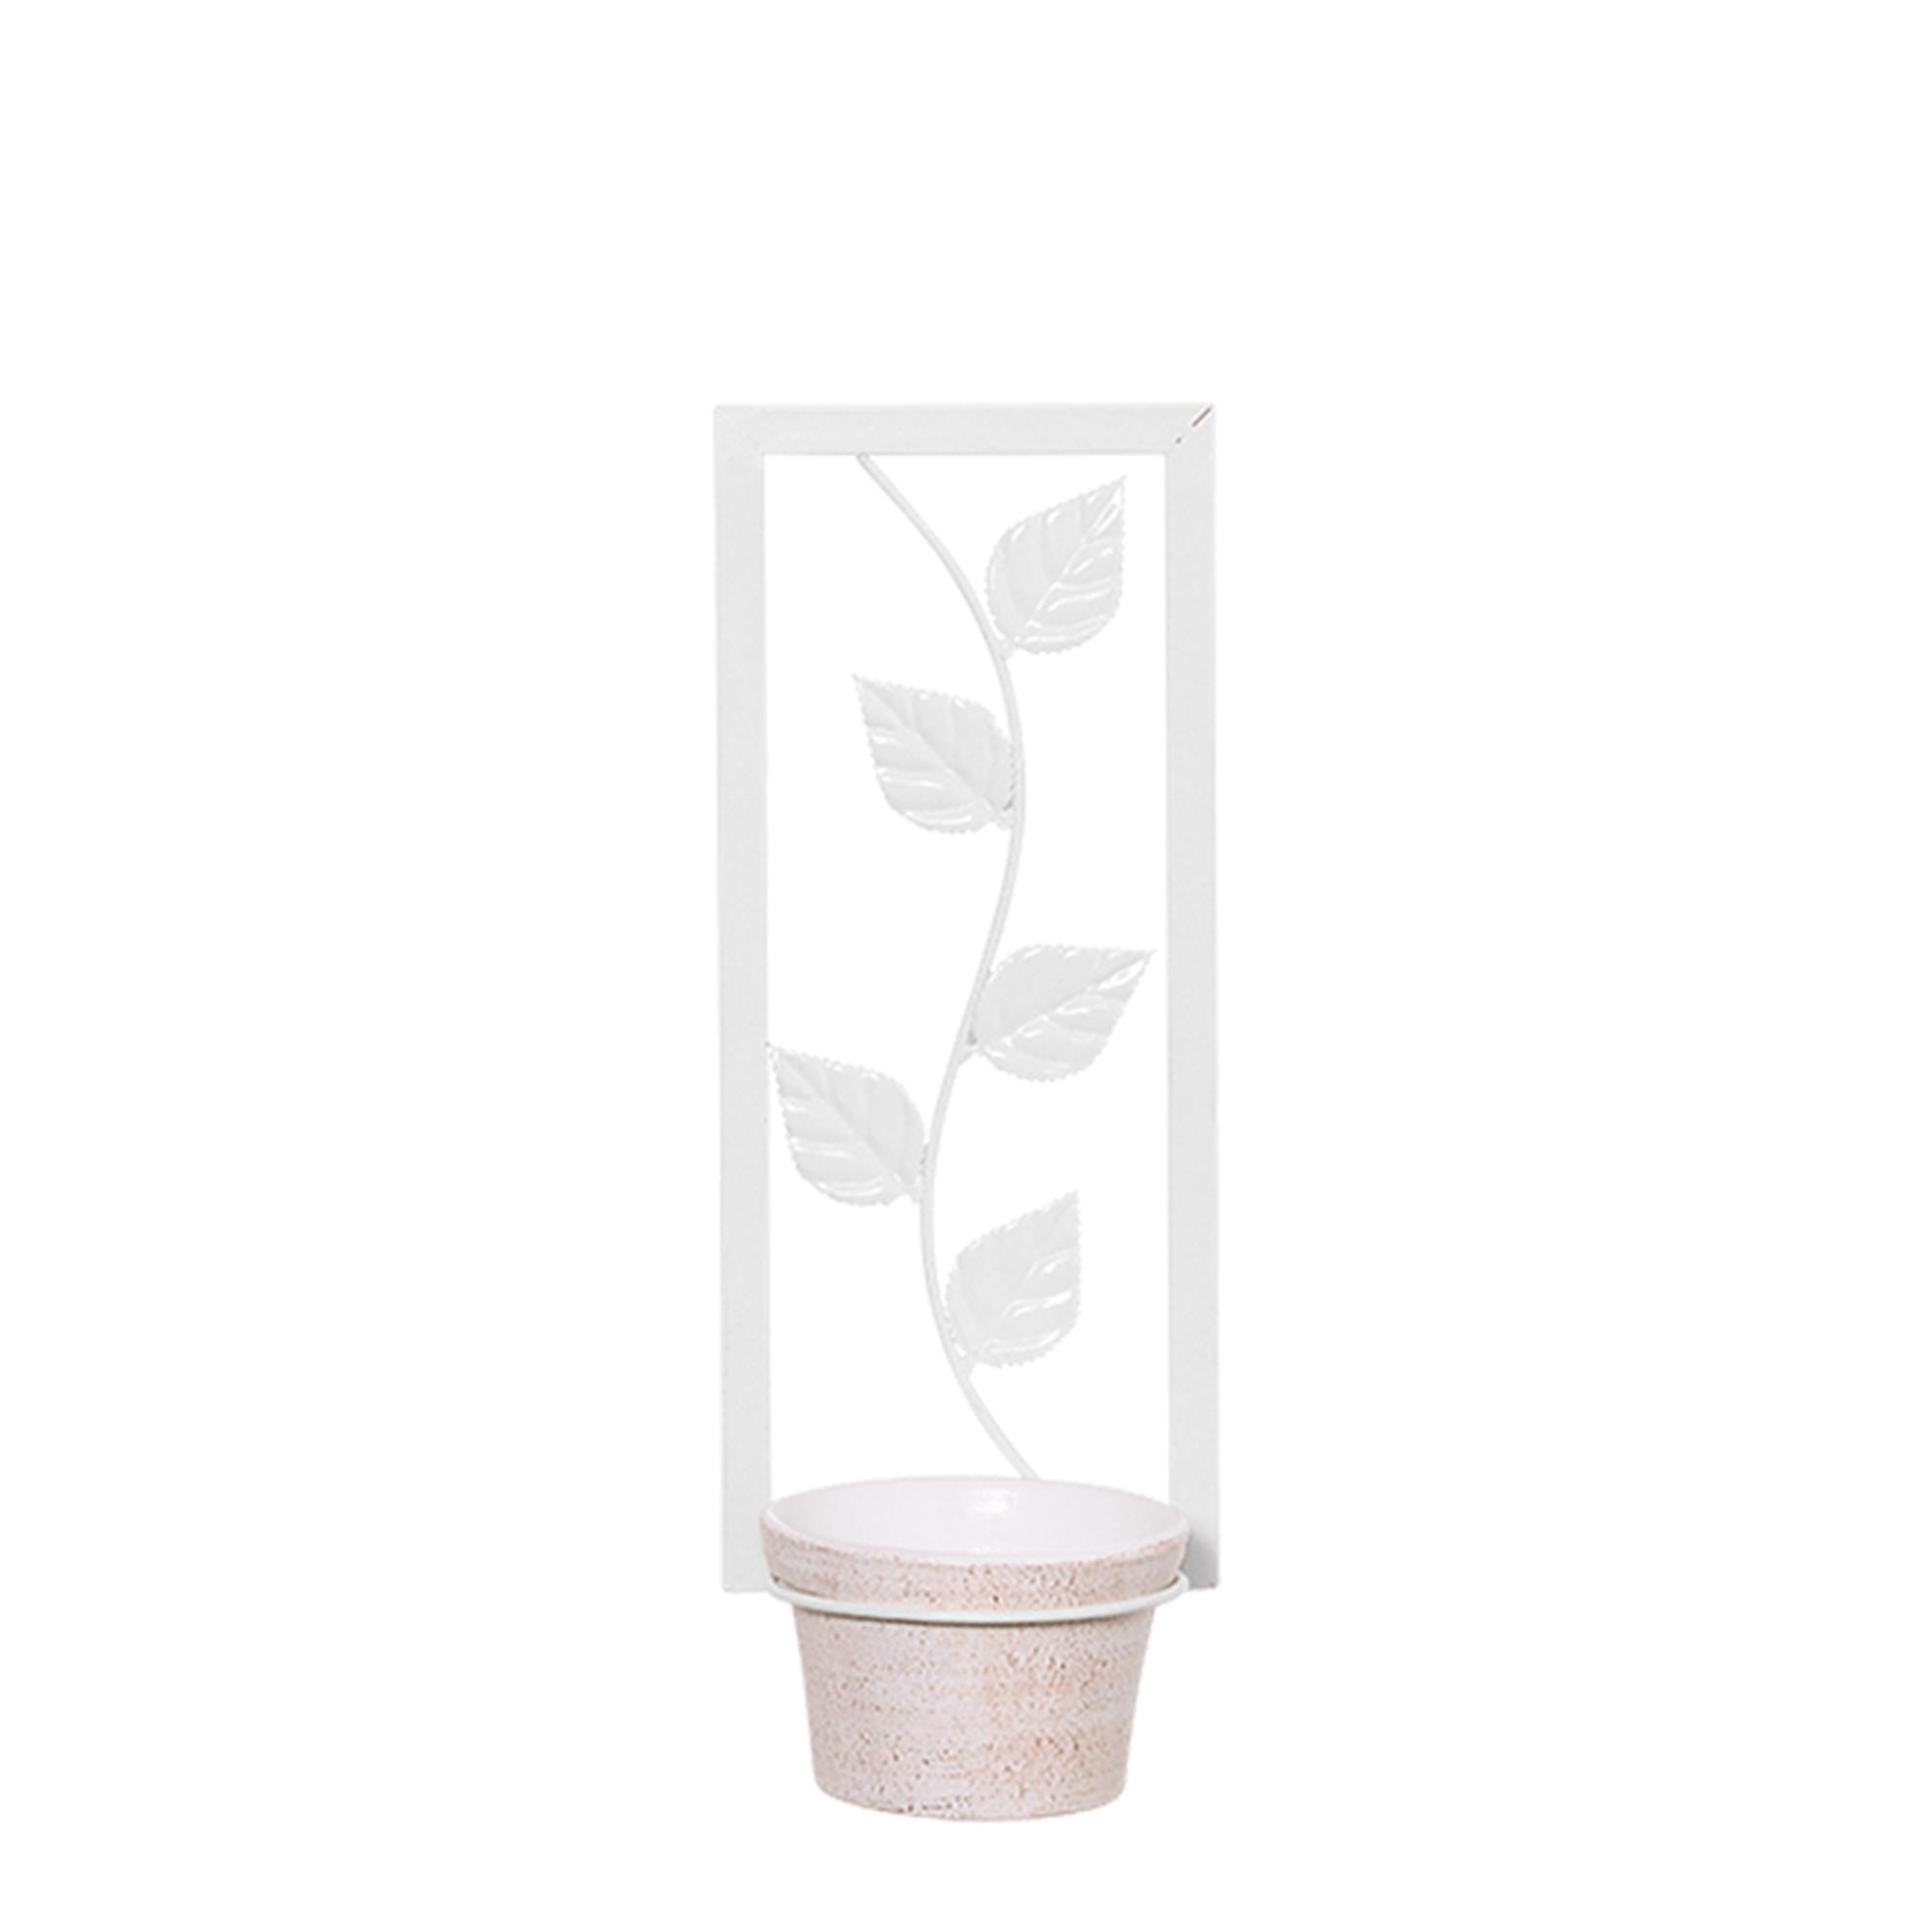 Suporte Vertical c/ 1 Vaso